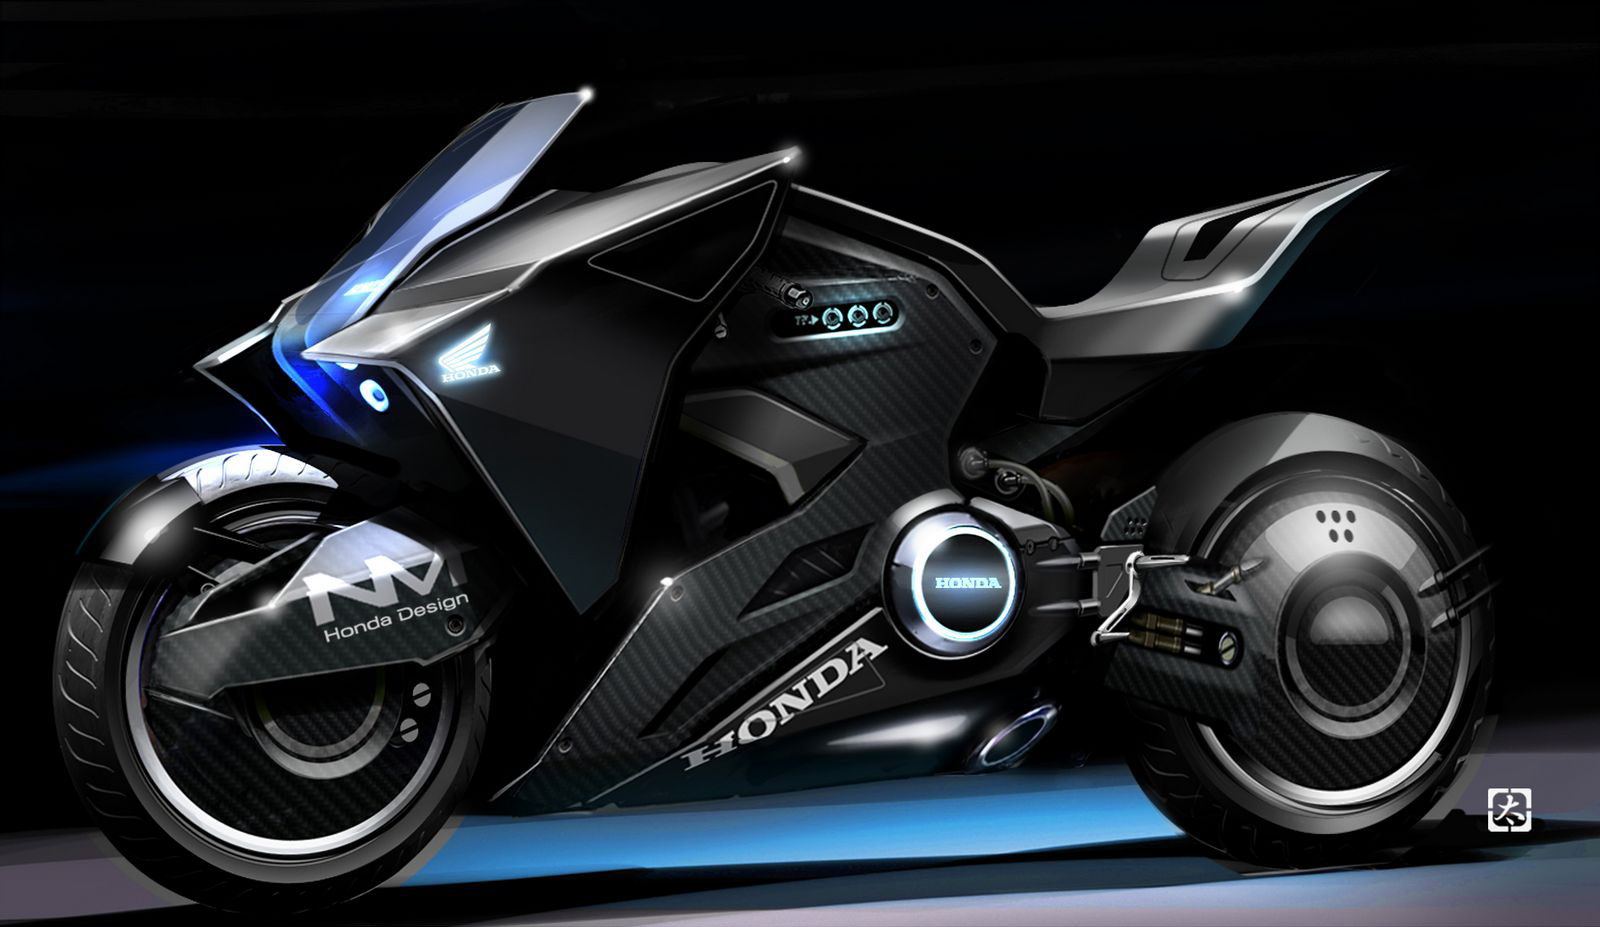 Scarlett_Johansson_Ghost_in_the_Shell_Honda_NM4_Concept_Moto-Mucci (4).jpg